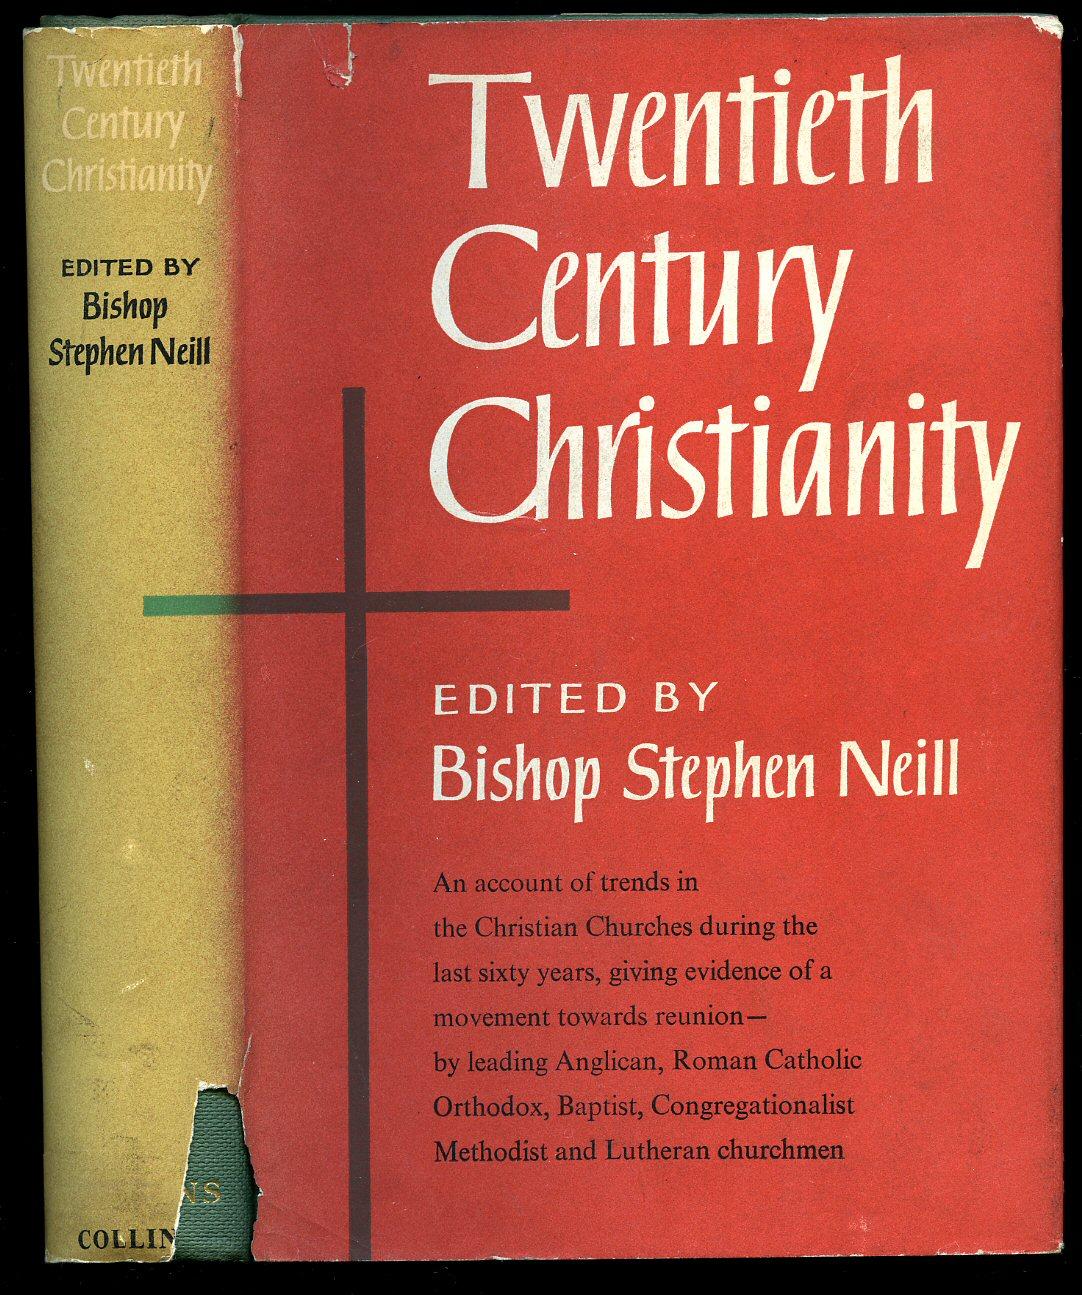 NEILL, BISHOP STEPHEN - Twentieth Century Christianity; A Survey of Modern Religious Trends by Leading Churchmen